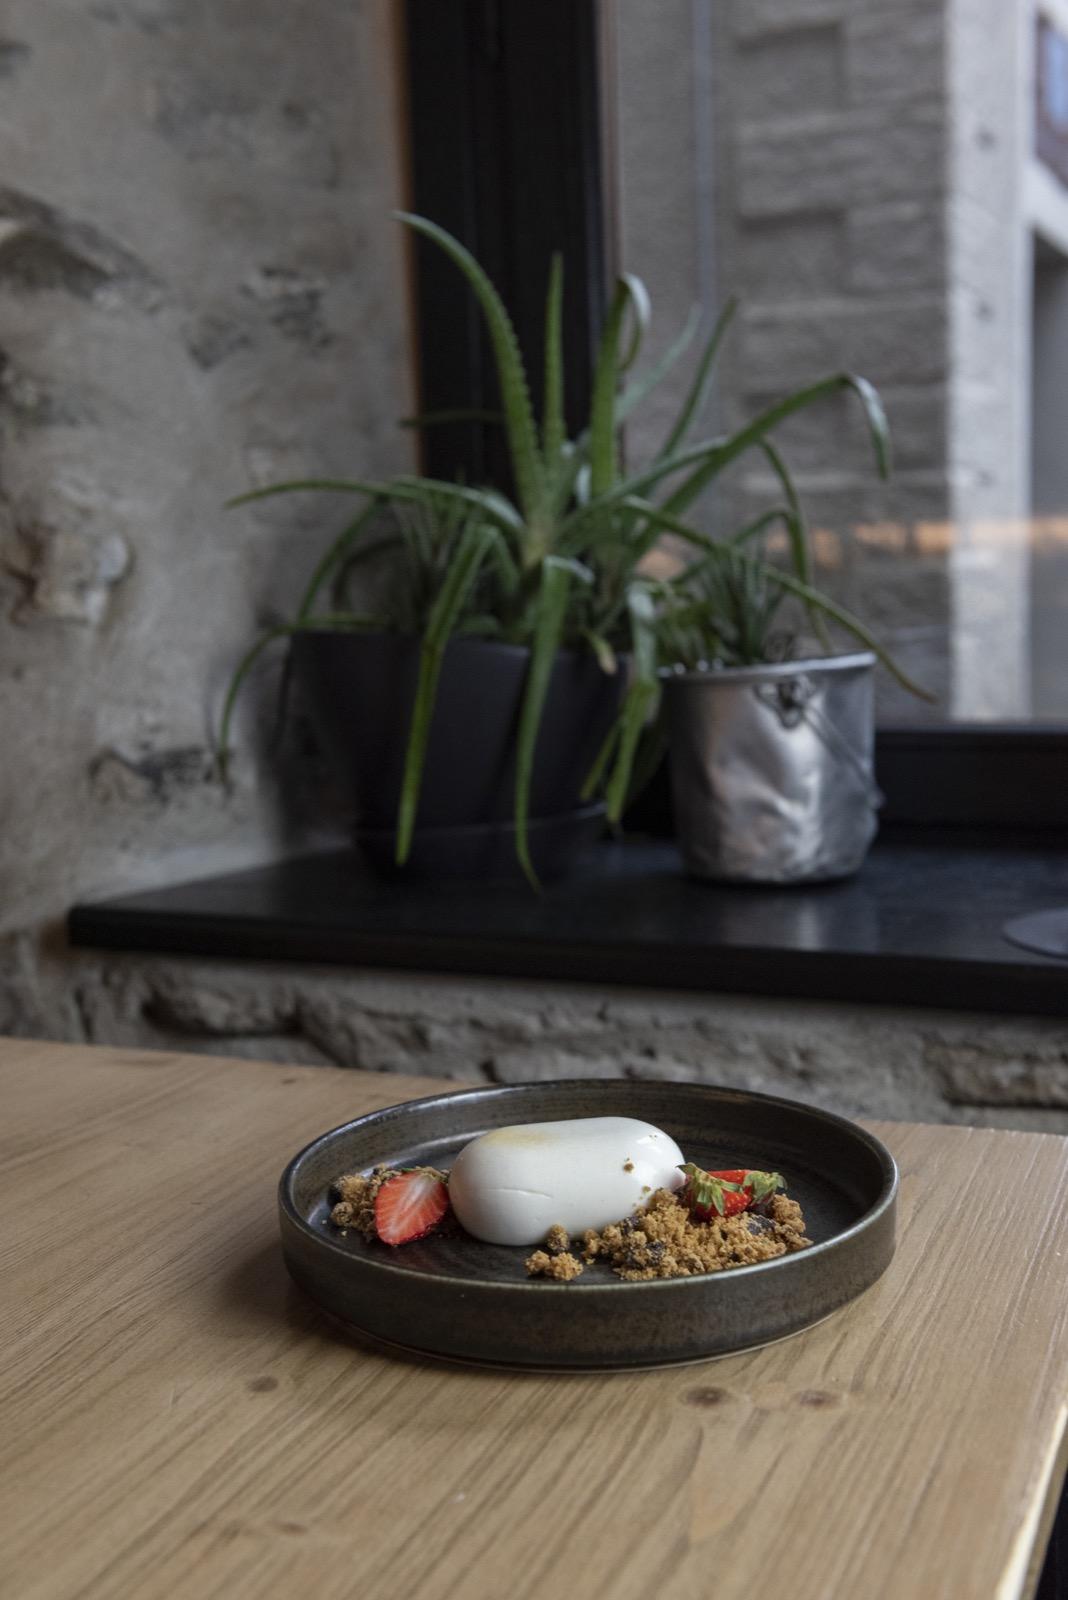 Mousse allo yogurt e fragole, crumble alle noci Pecan